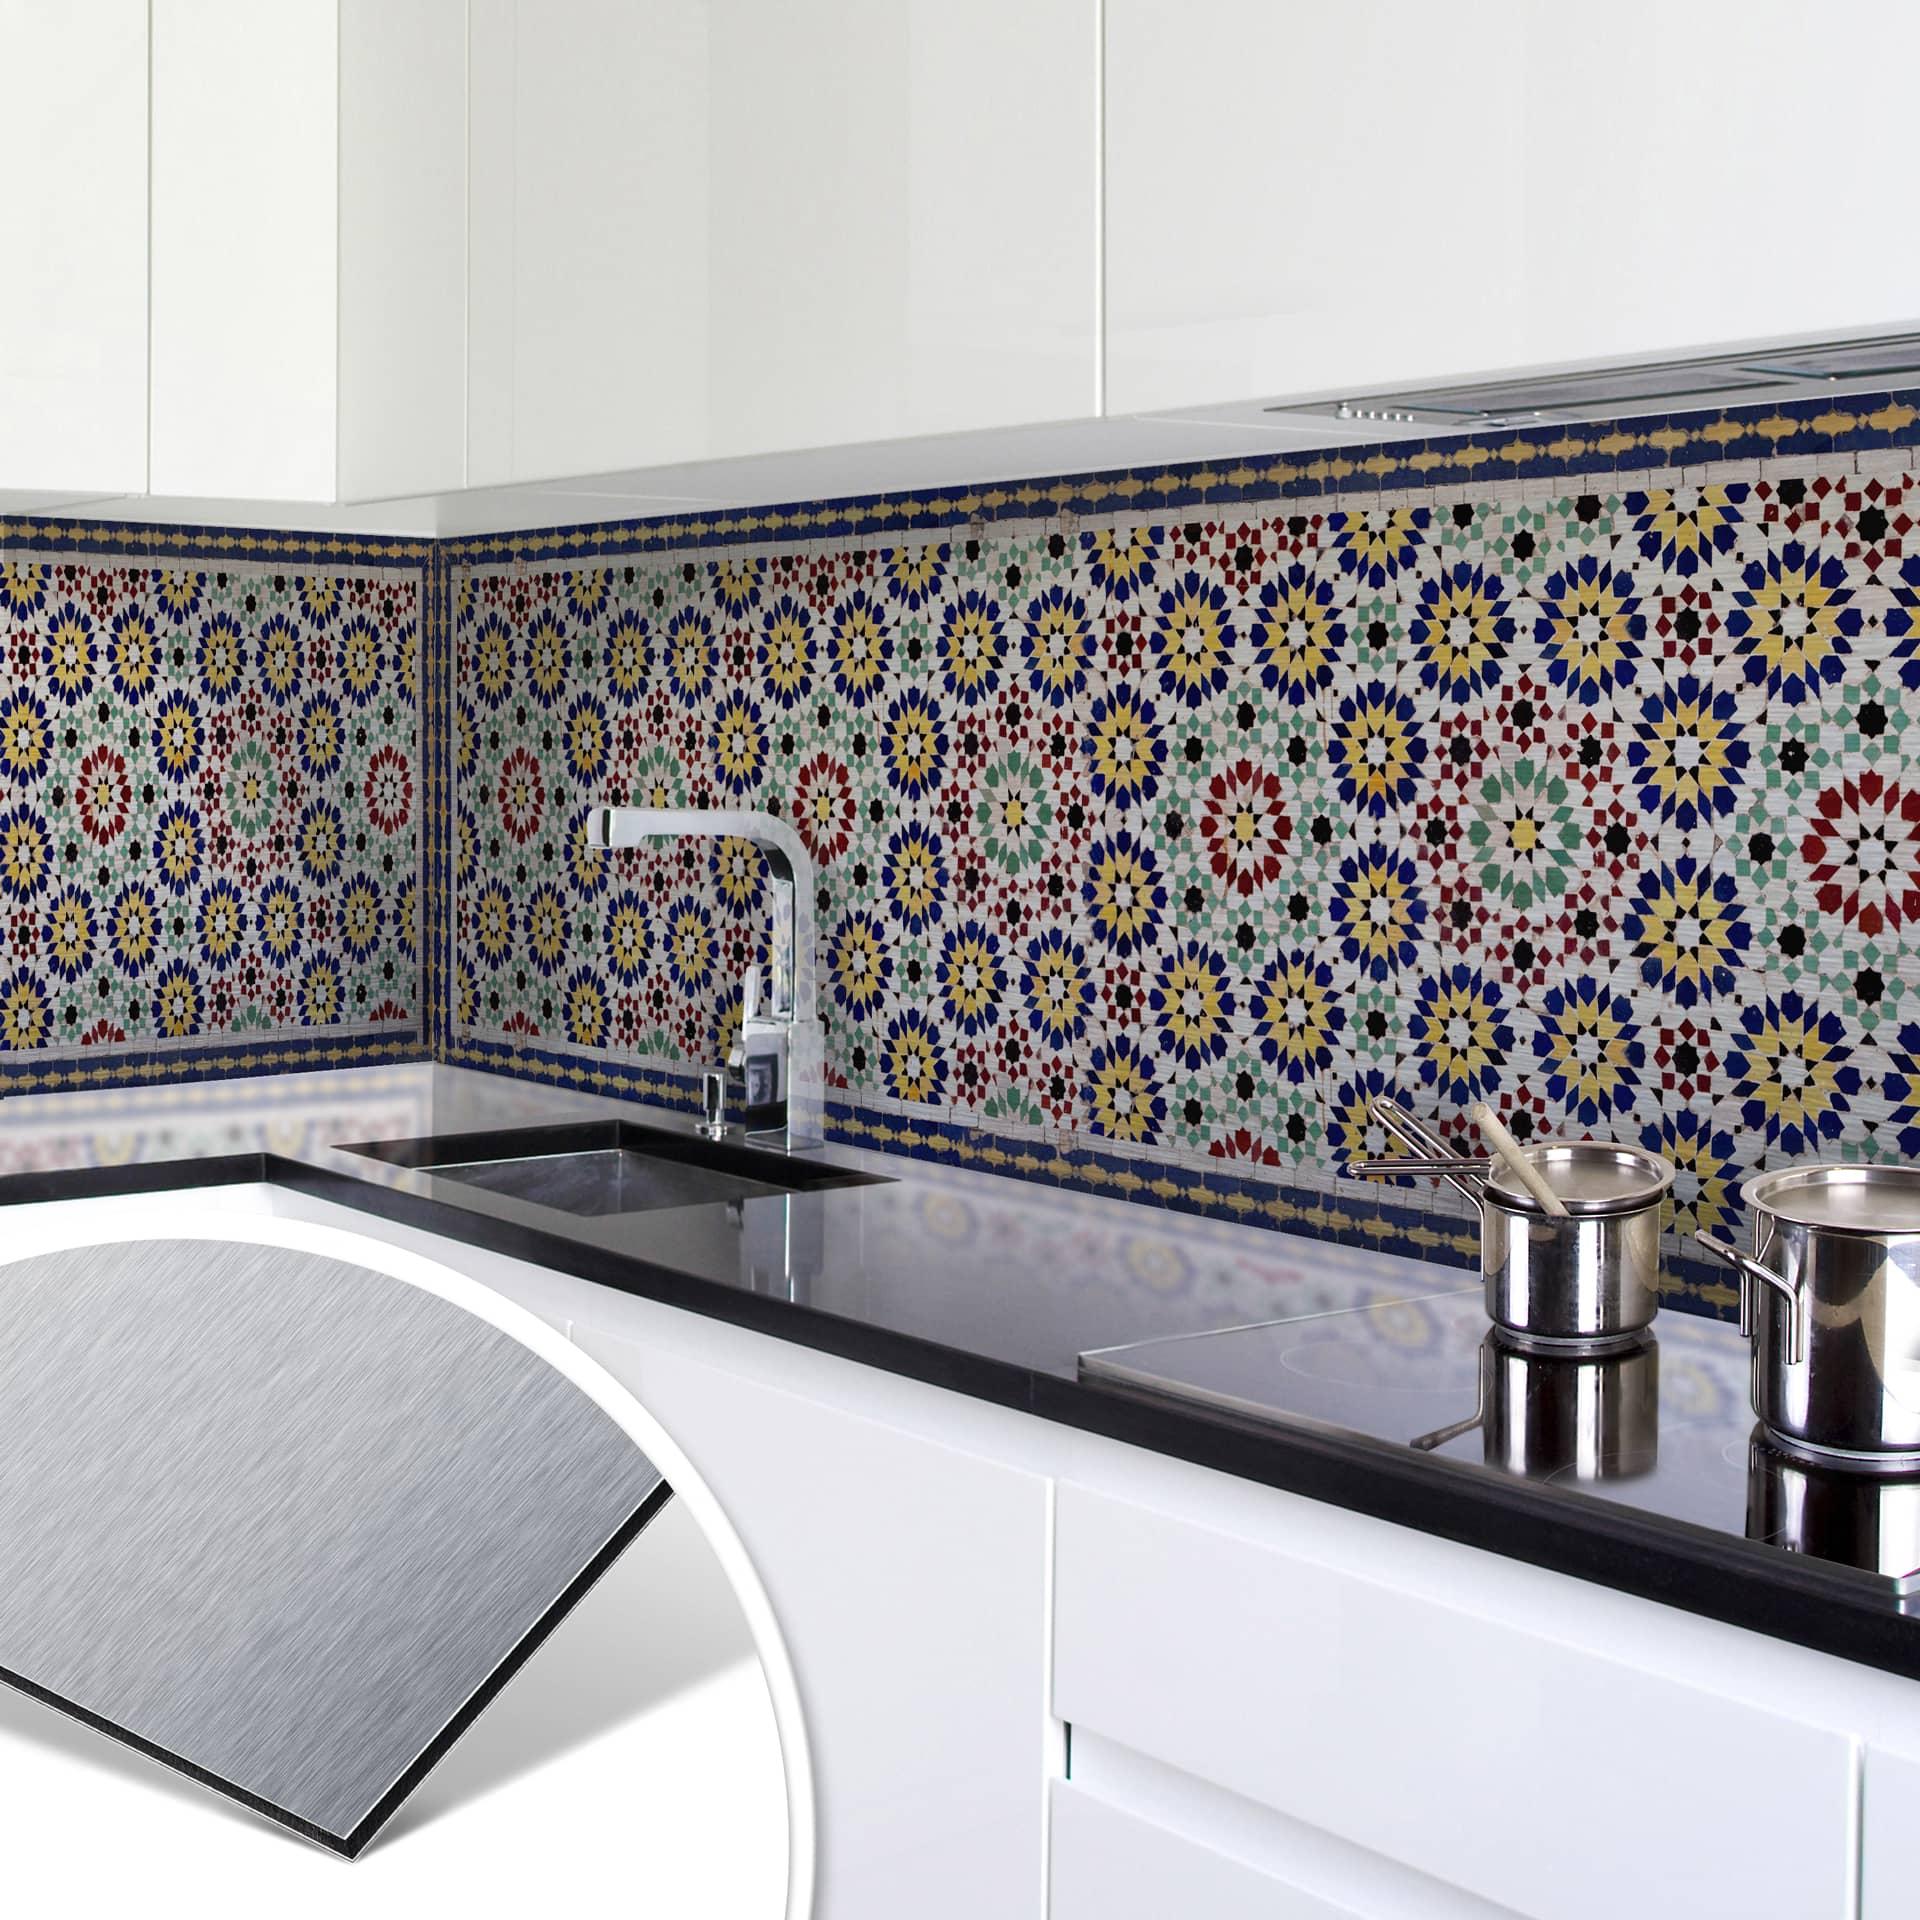 k chenr ckwand alu dibond silber orientalische kacheln 01 ebay. Black Bedroom Furniture Sets. Home Design Ideas